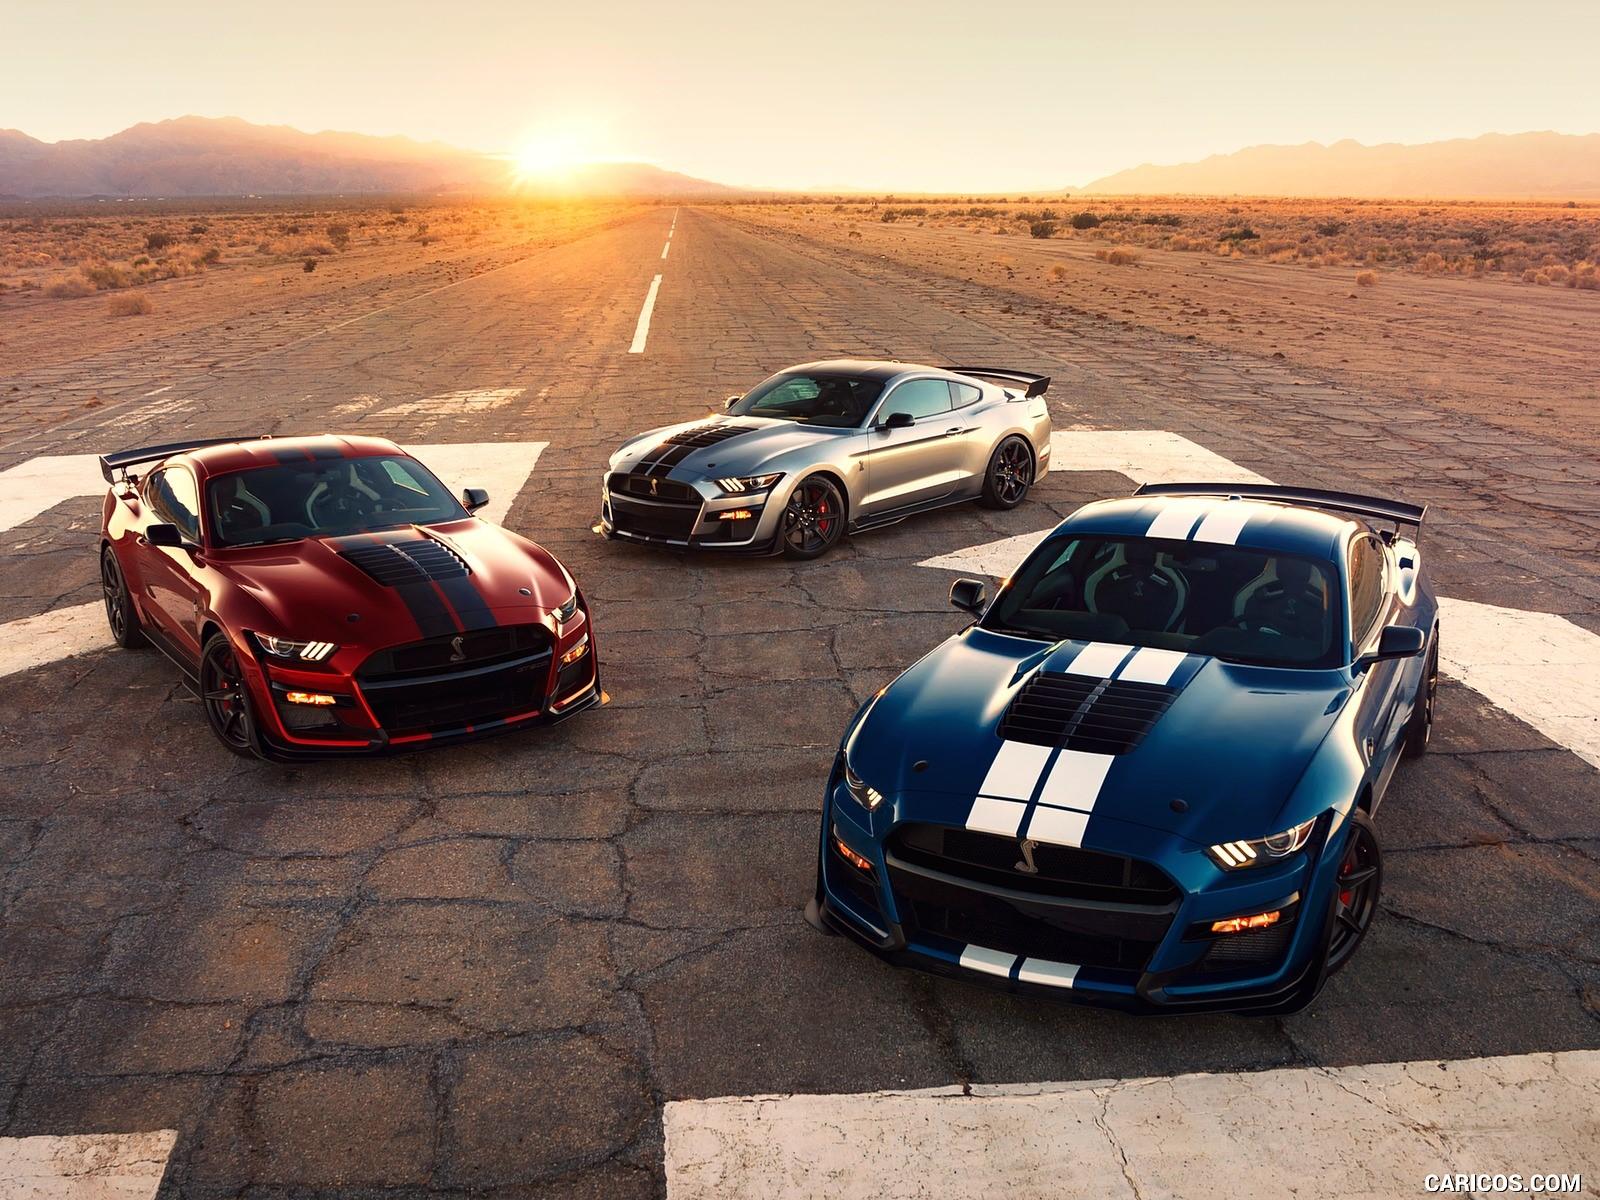 Ford Mustang Shelby uhd duvarkağıdı 1